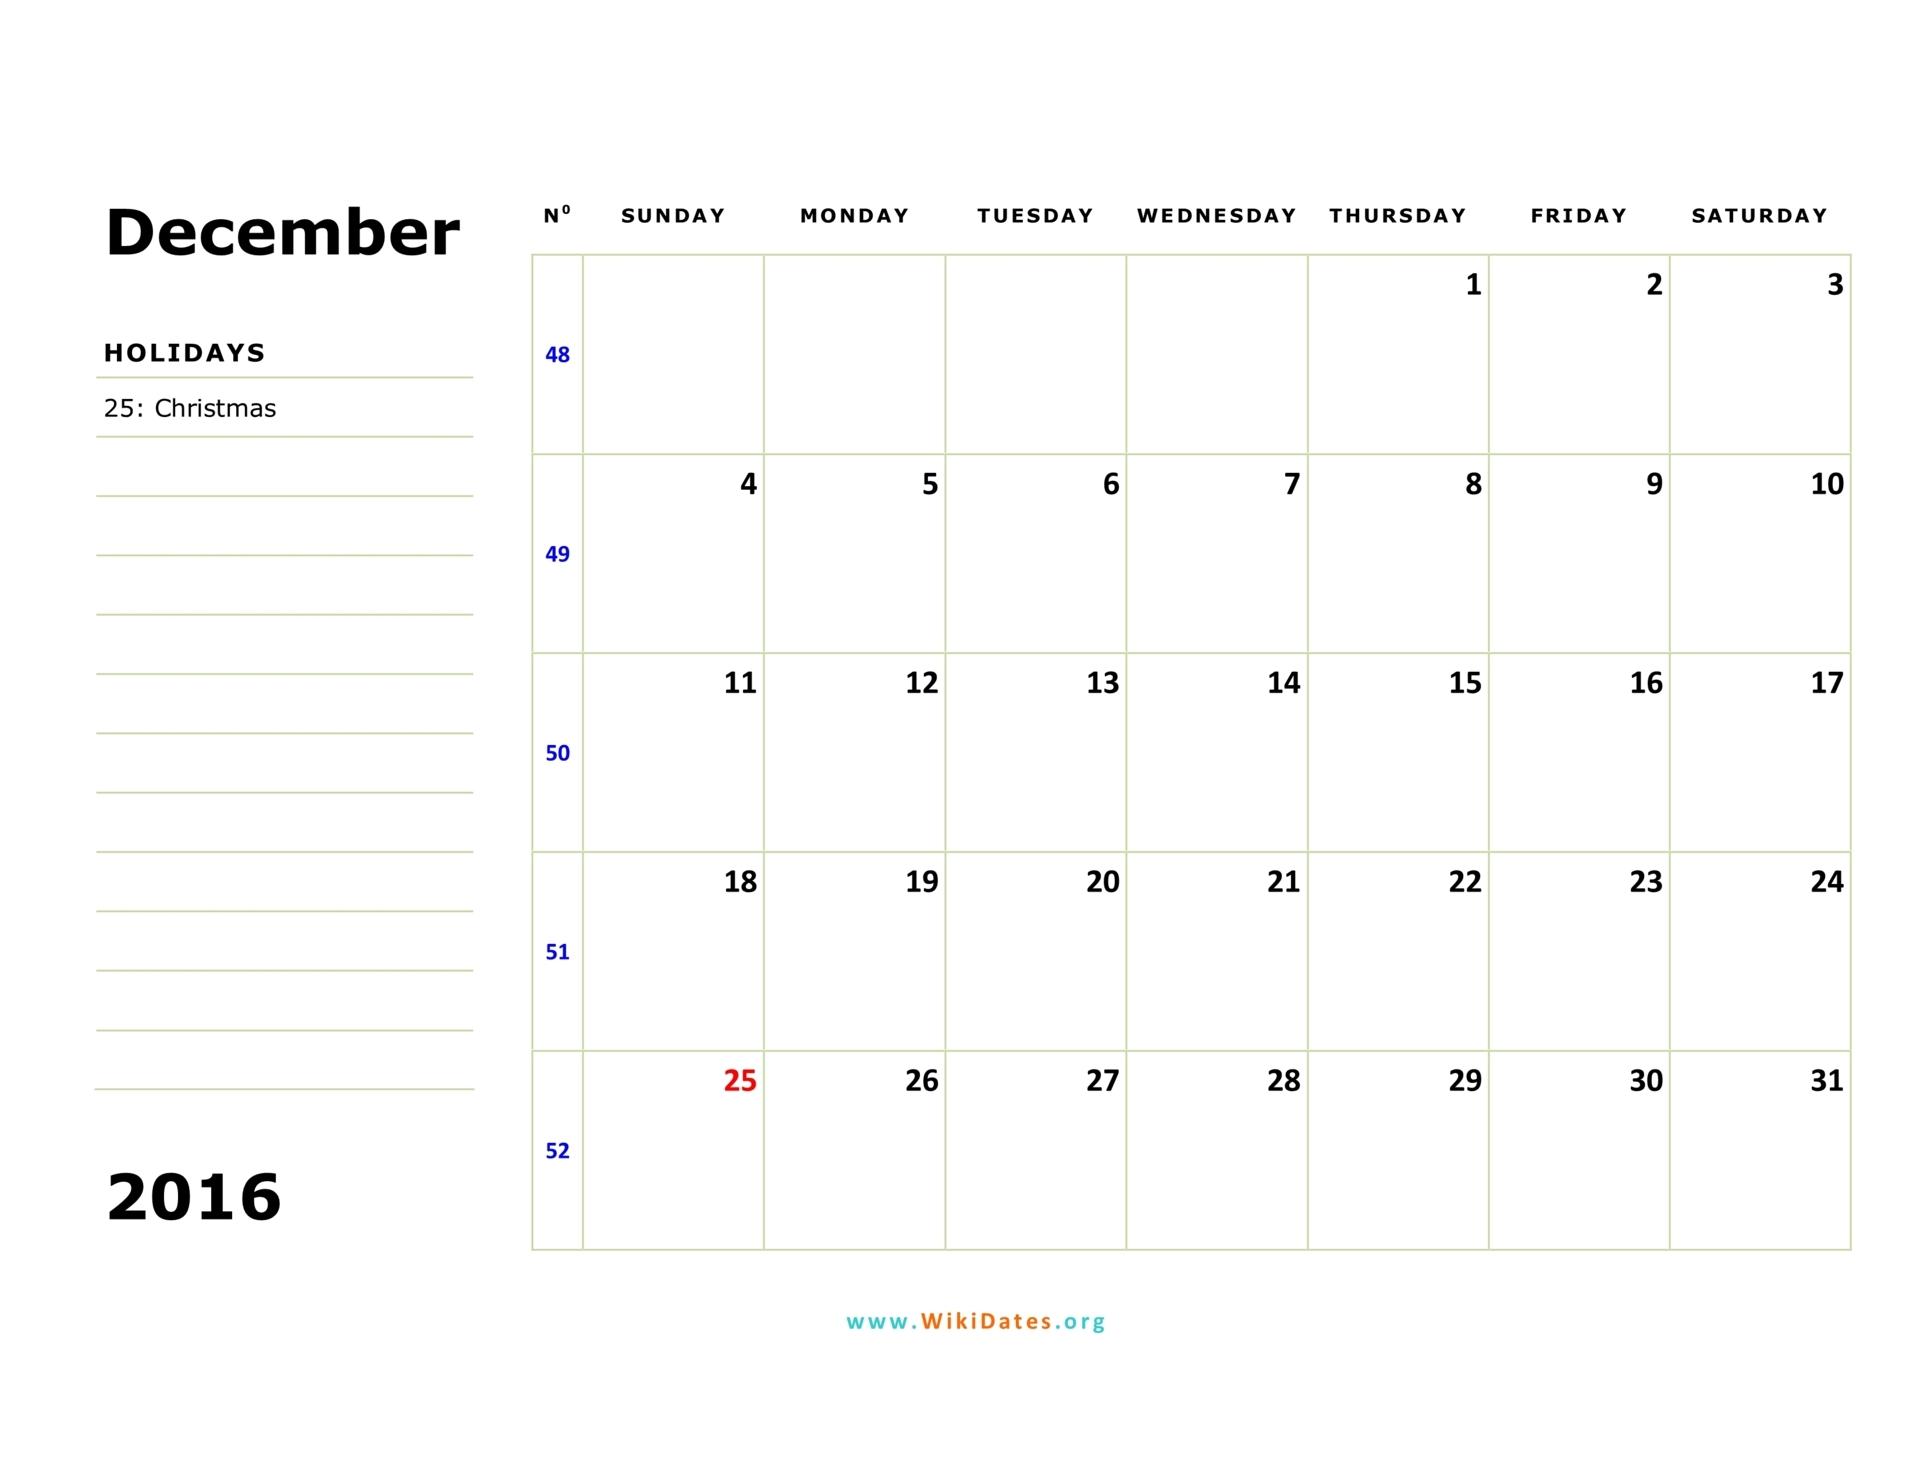 December Calendar 2016 With Holidays